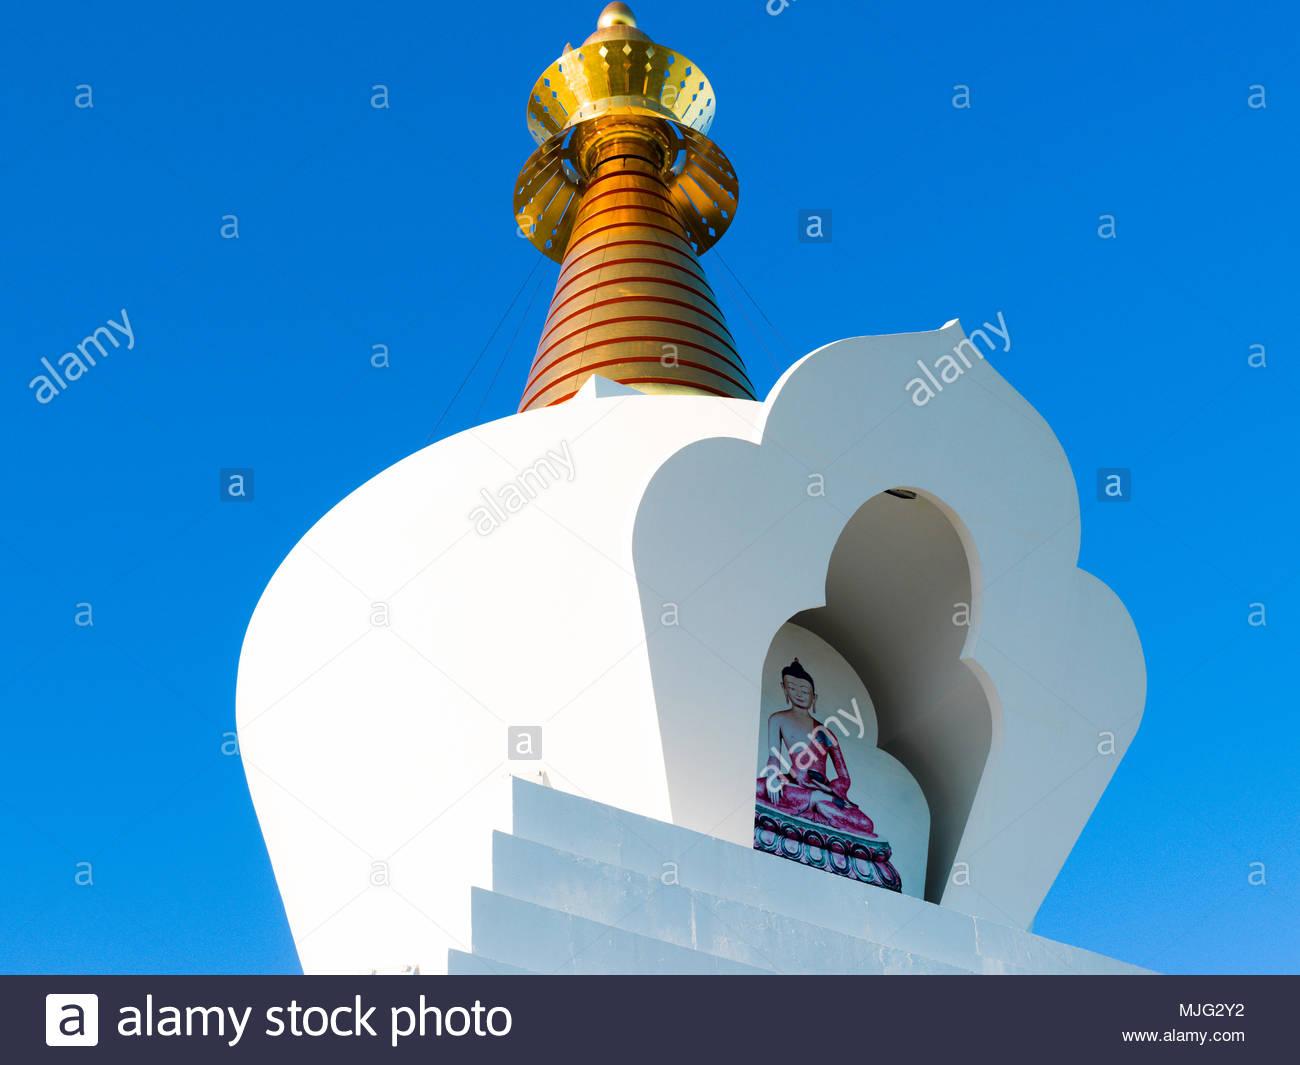 Estupa de la Iluminacion, Benalmadena, Costa del Sol Occidental, Malaga, Andalusia, Spain, Iberian Peninsula - Stock Image